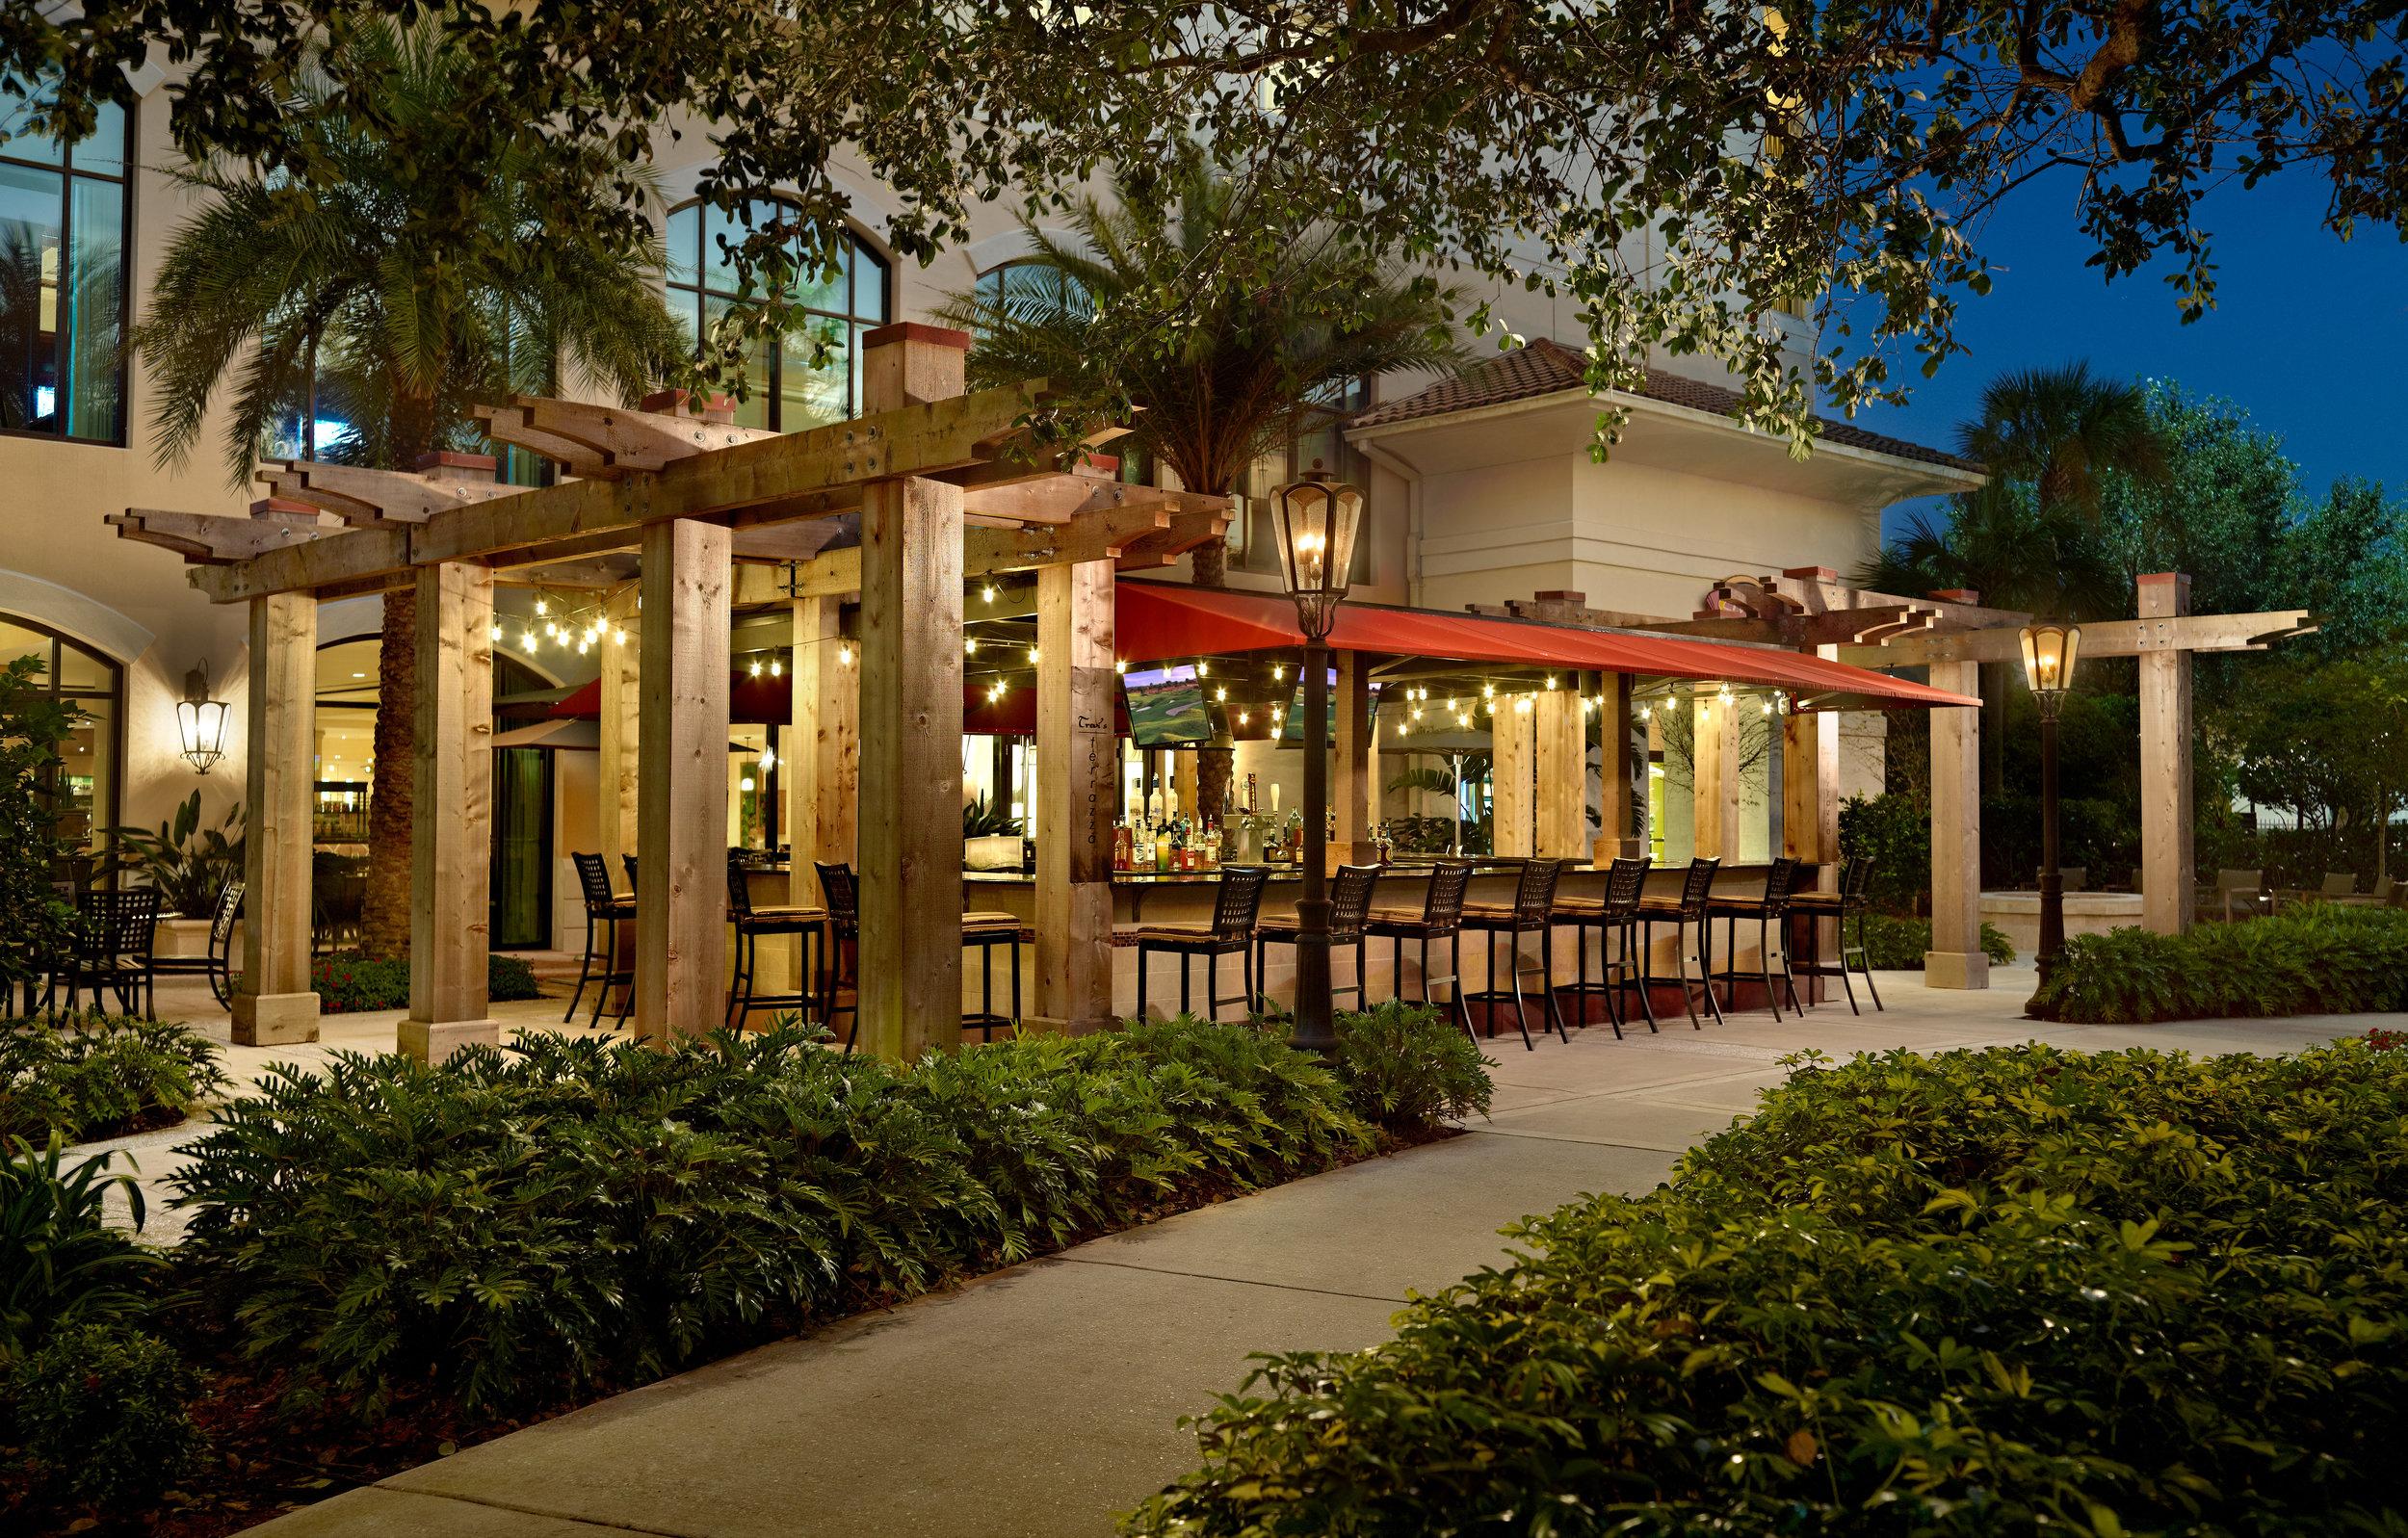 La Cita Will be Held at The  OMNI Orlando Resort at Championsgate